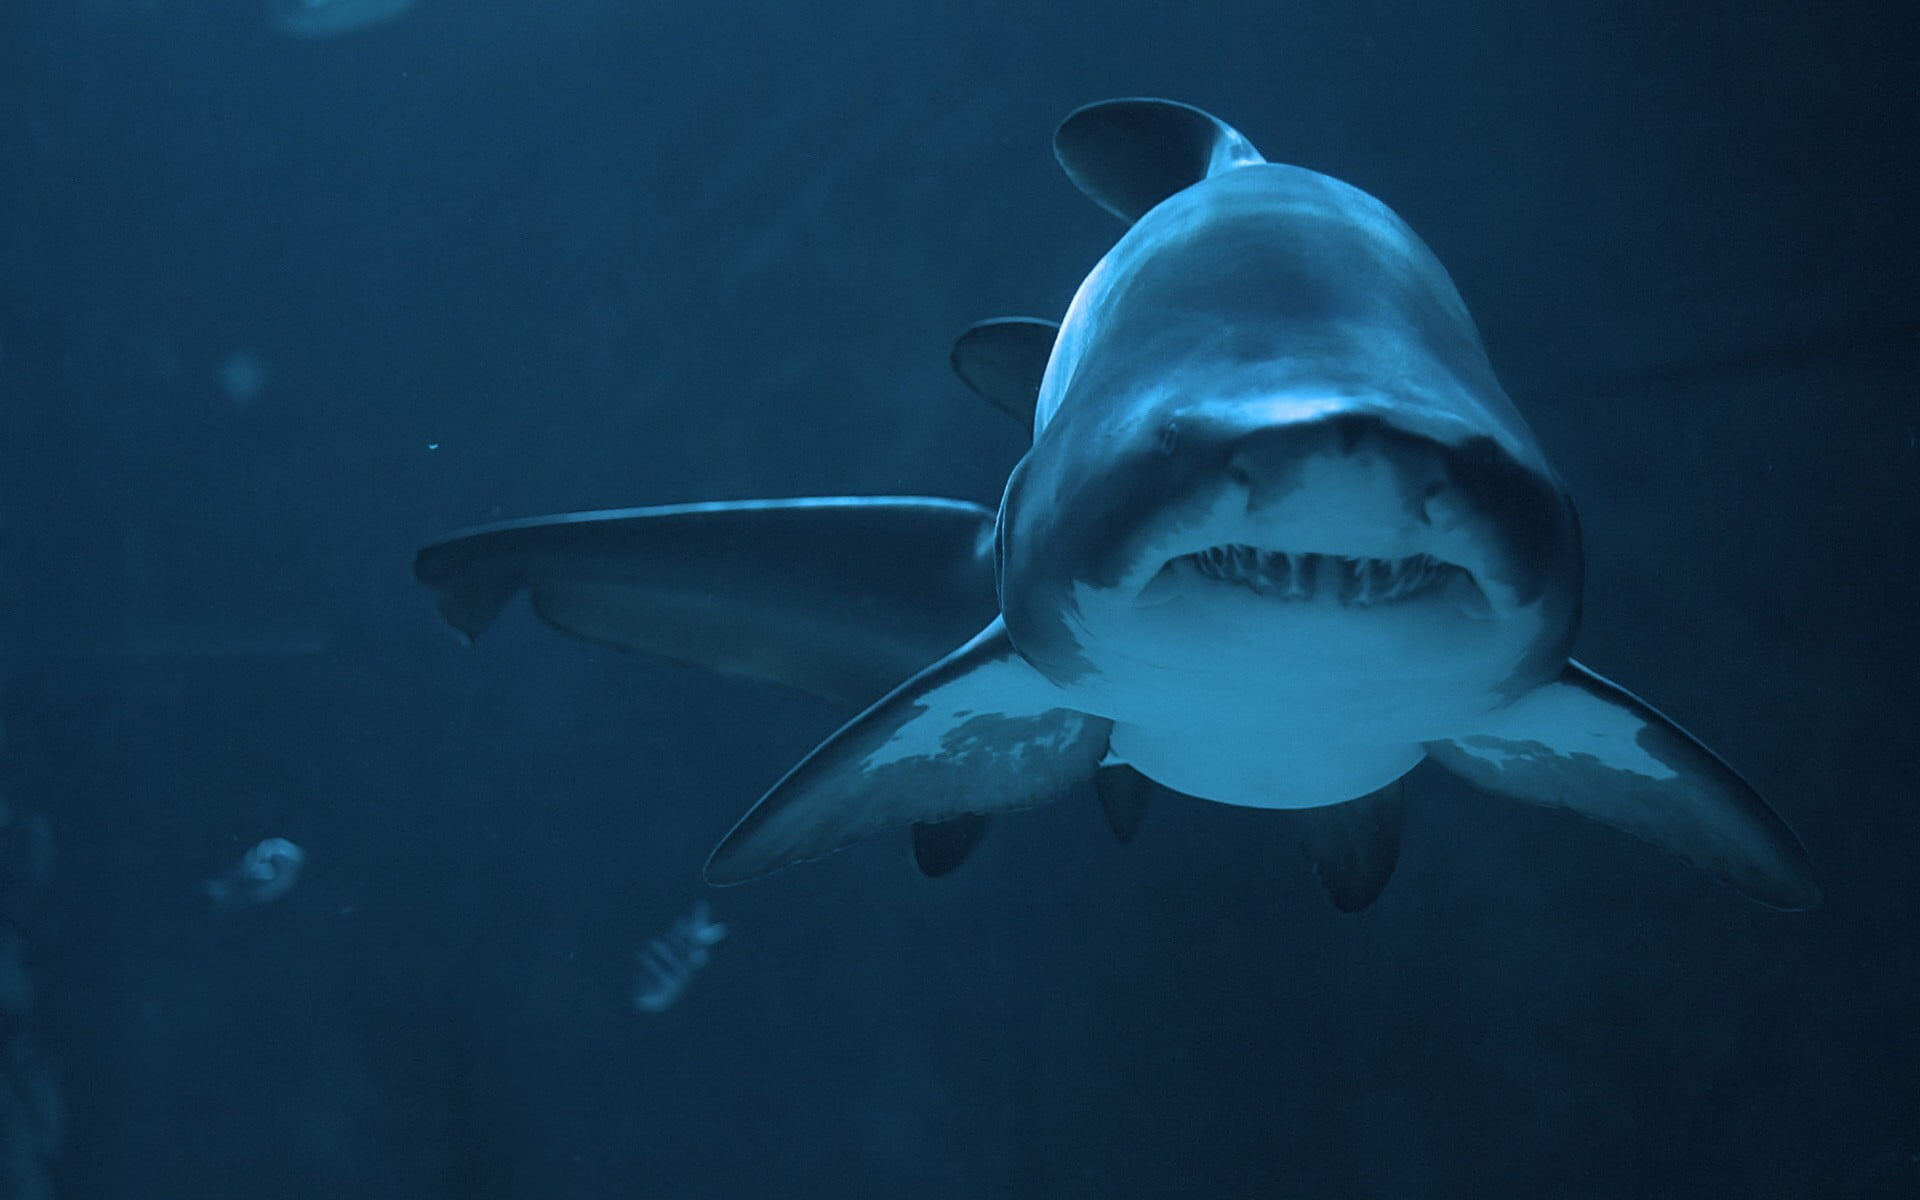 White and black fish decor shark animals HD wallpaper 1920x1200